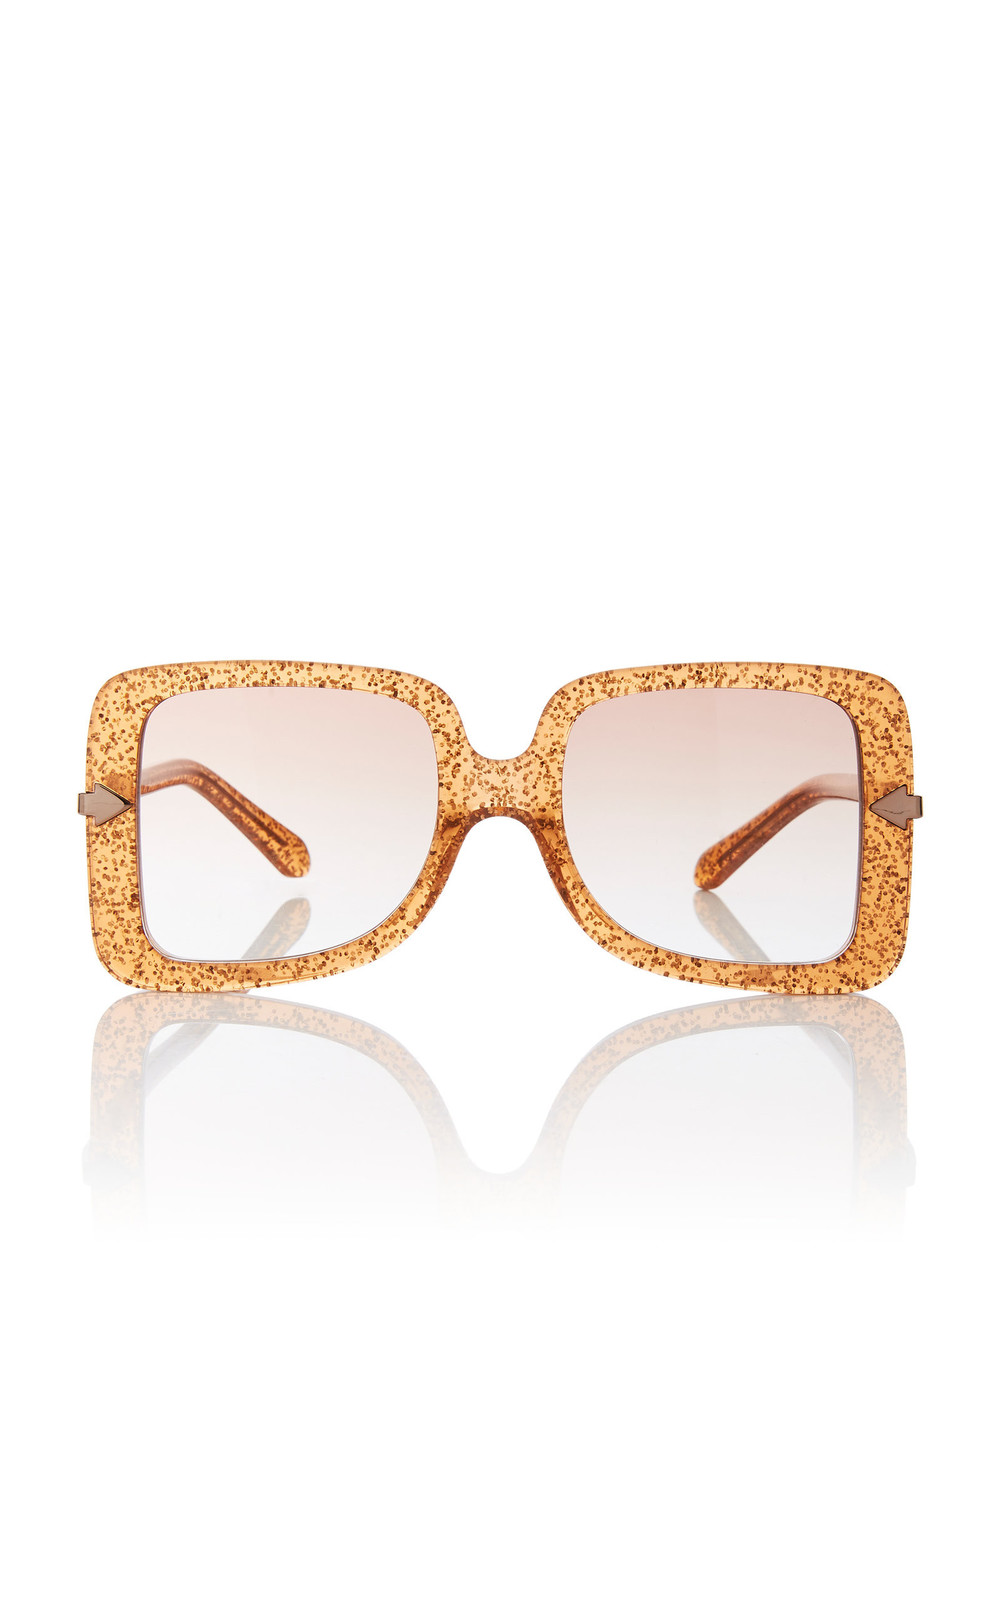 Karen Walker Eden Square-Frame Acetate Sunglasses in orange